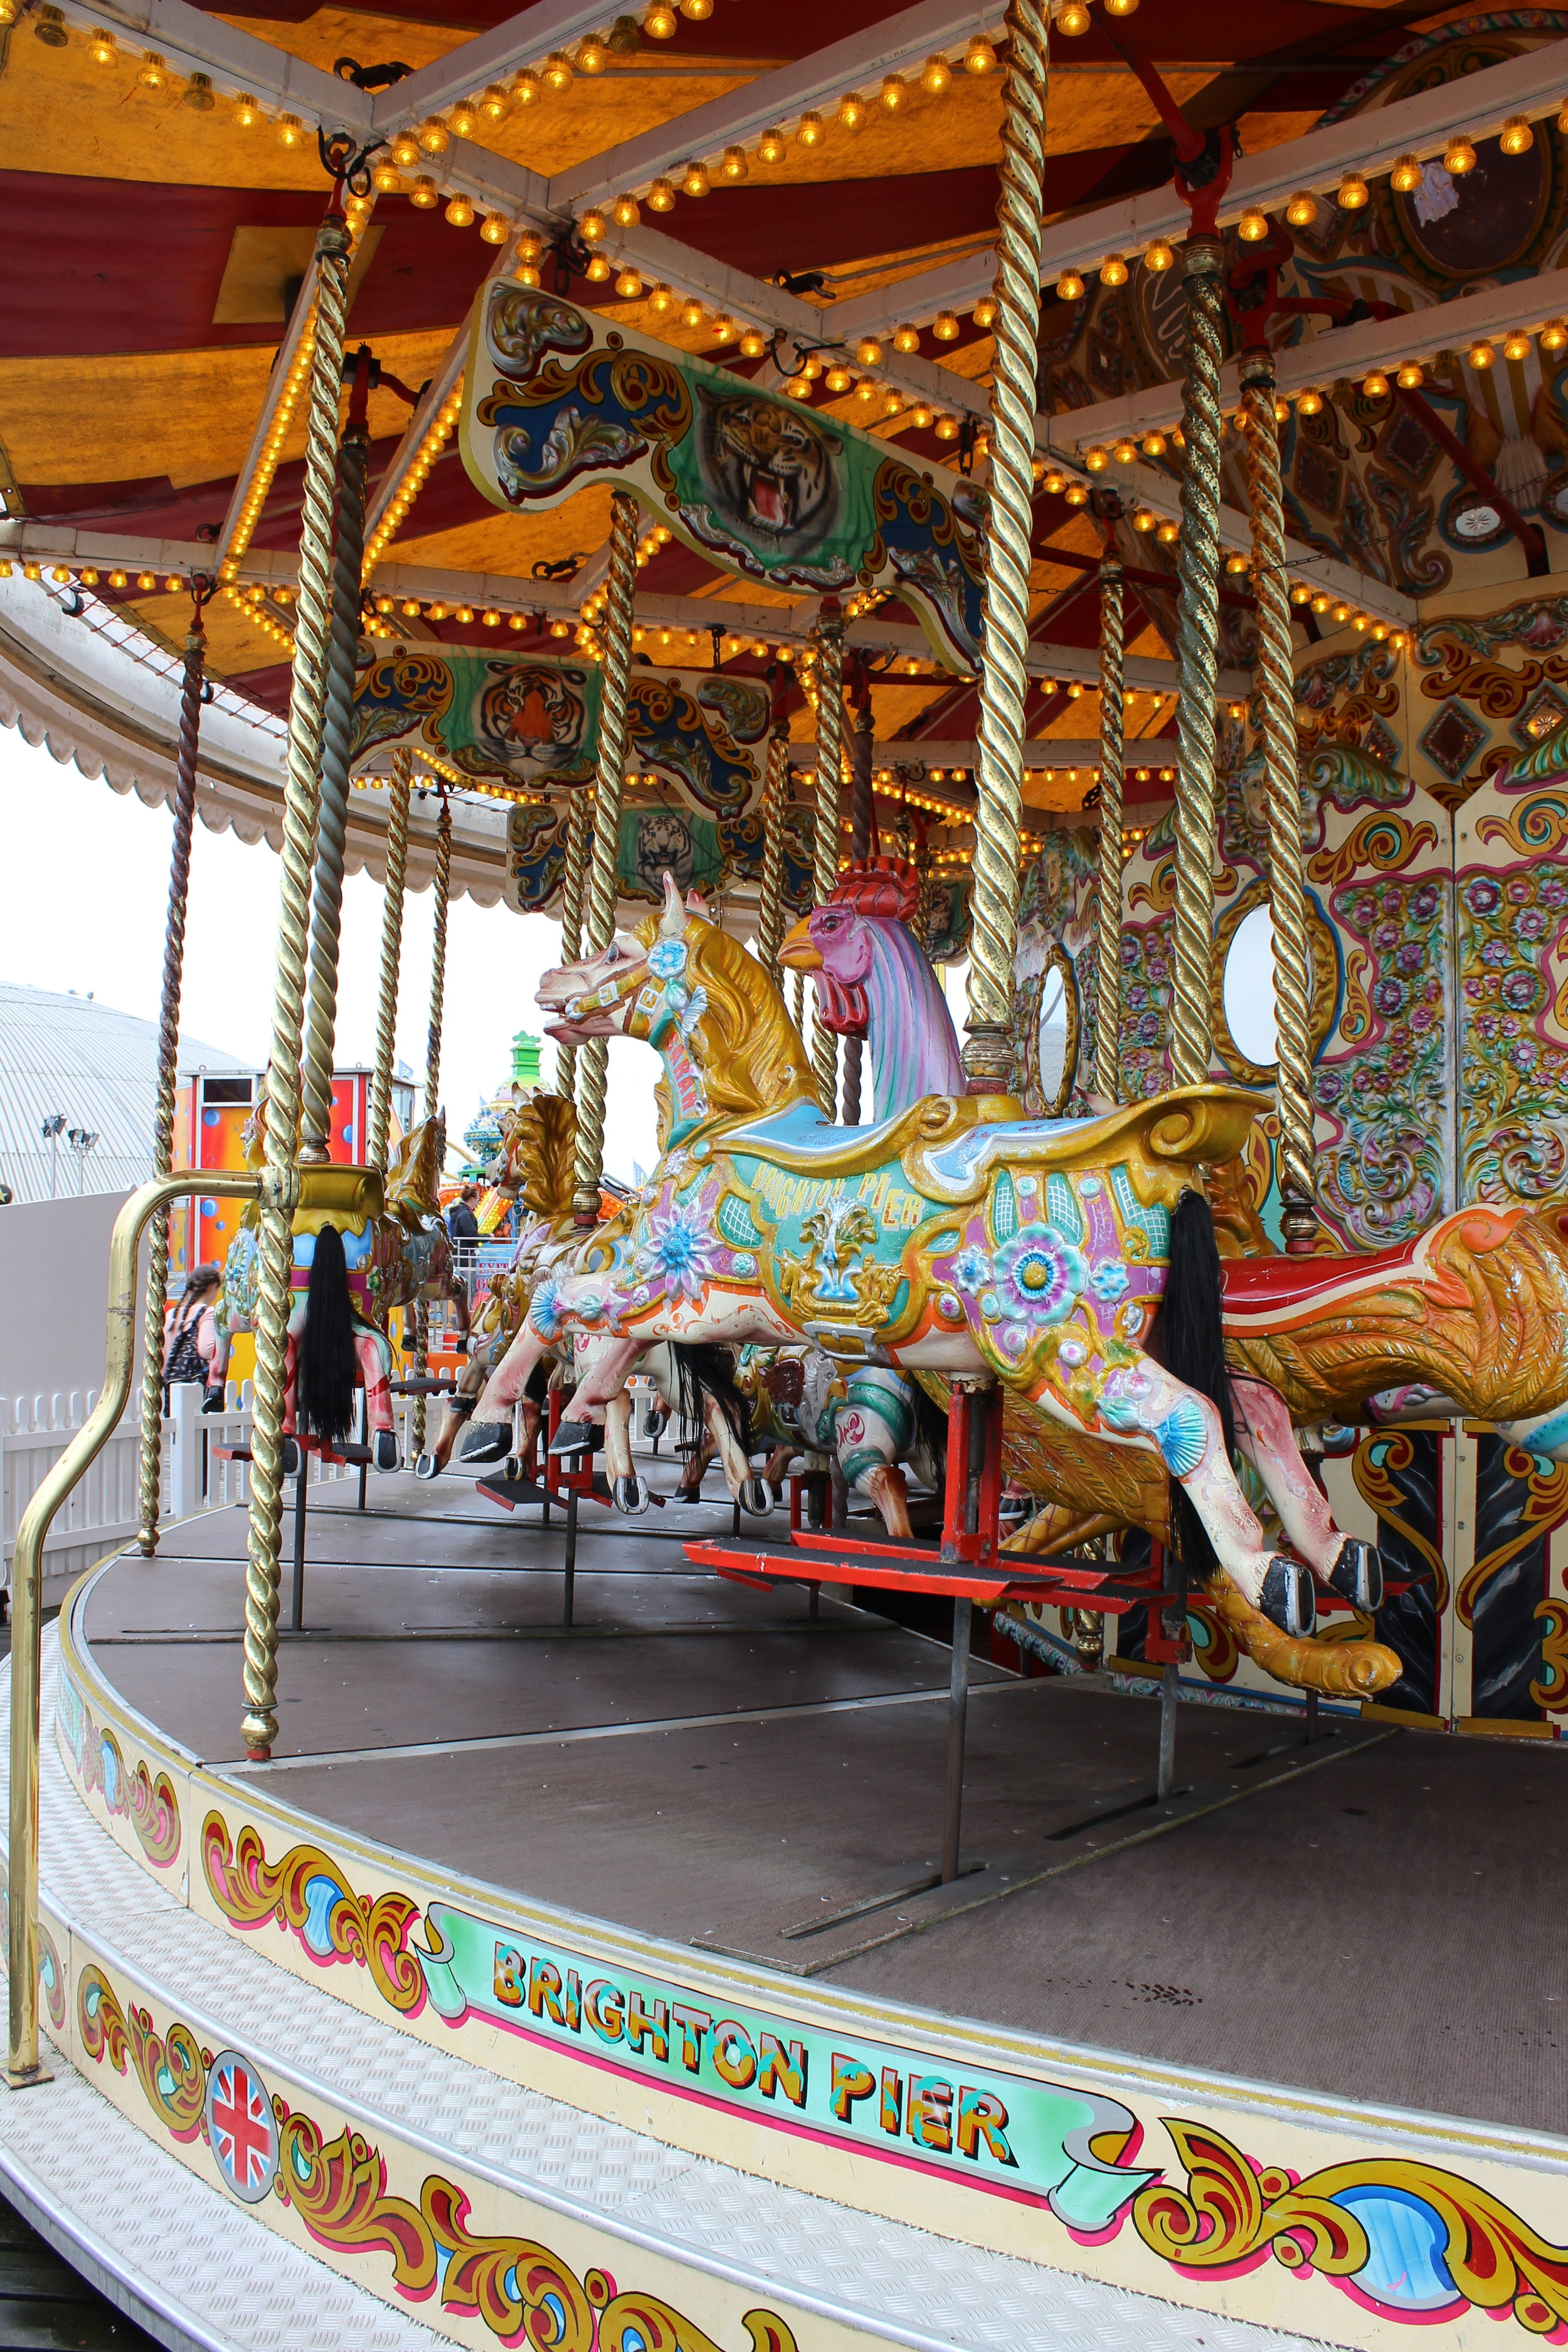 brighton-pier-carousel.JPG